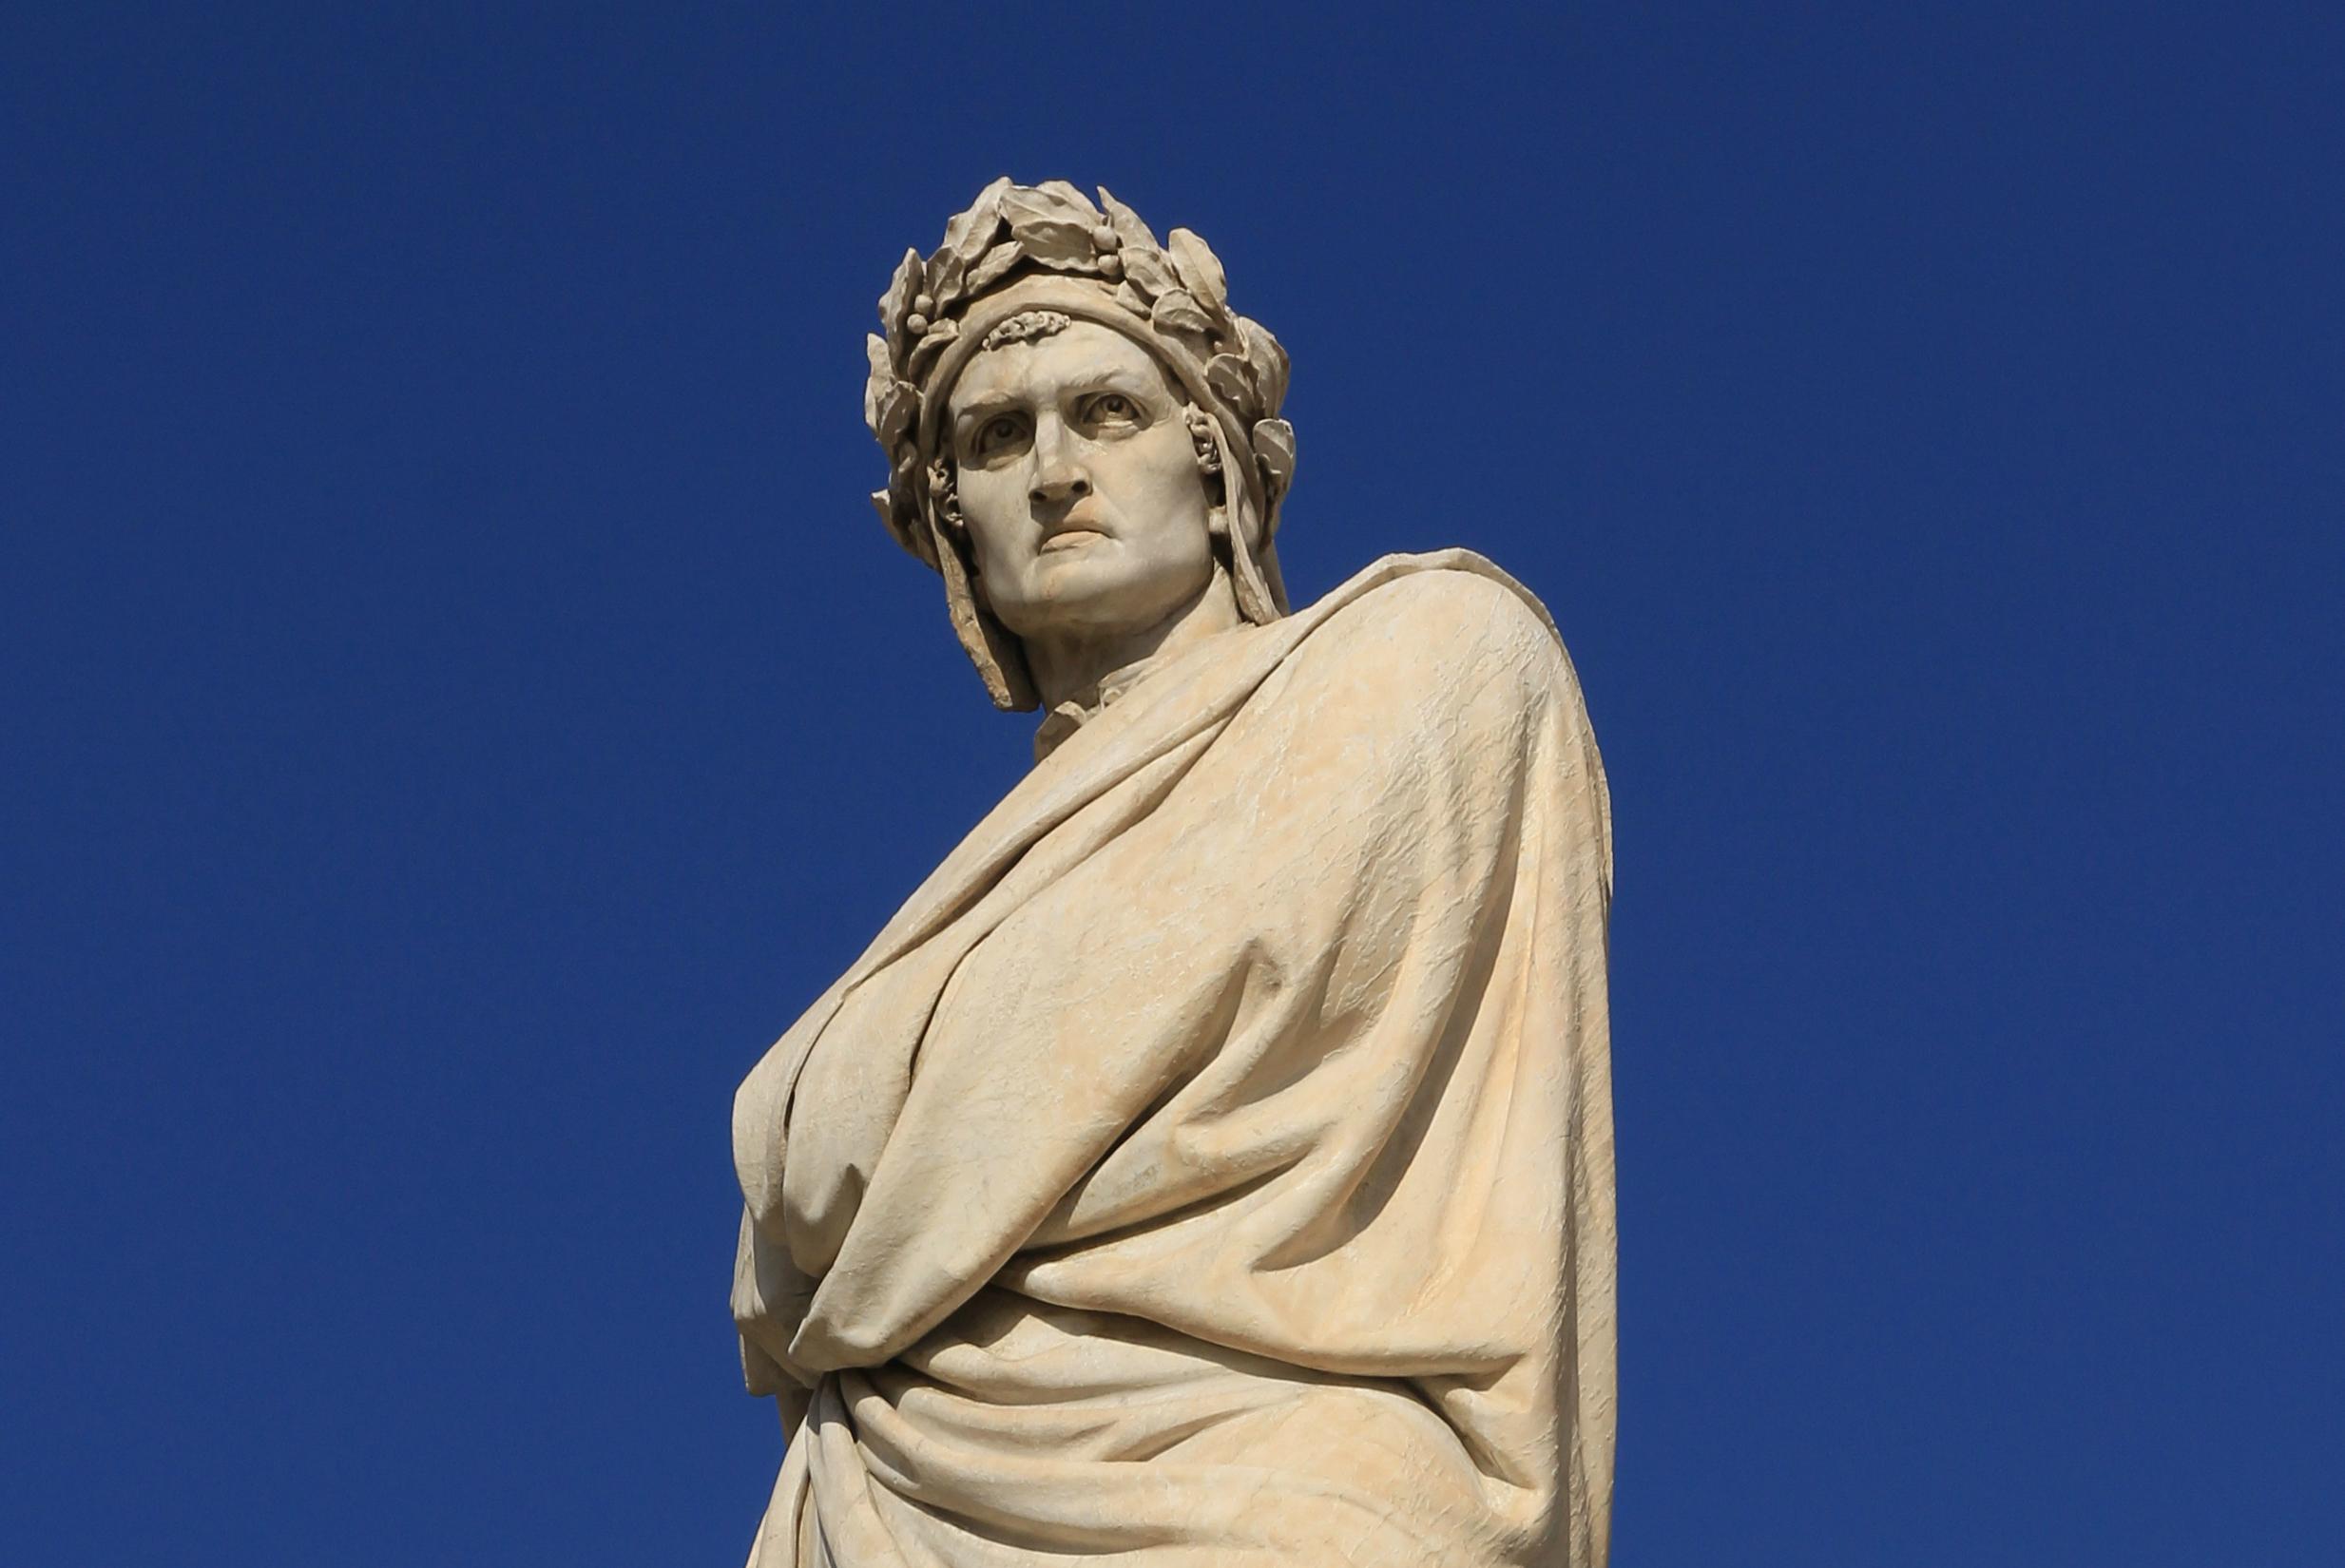 Statue of Dante Alighieri next to Santa Croce church